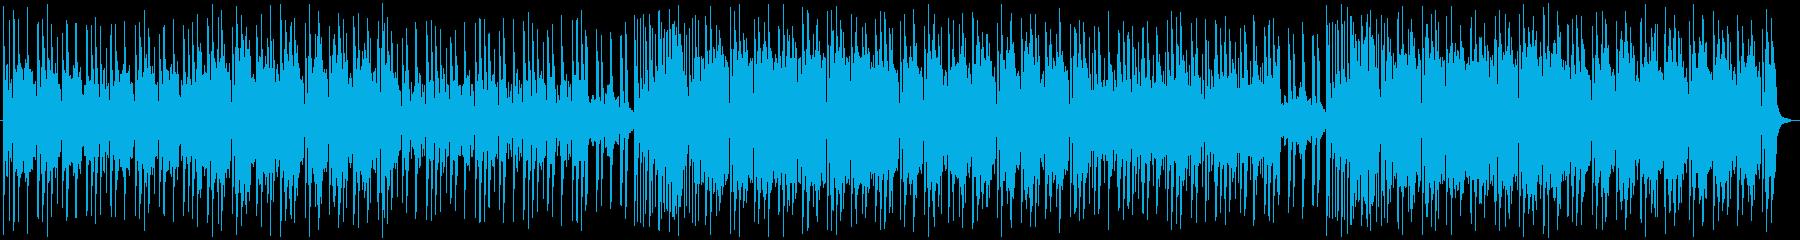 Kawaii FutureBass 02's reproduced waveform